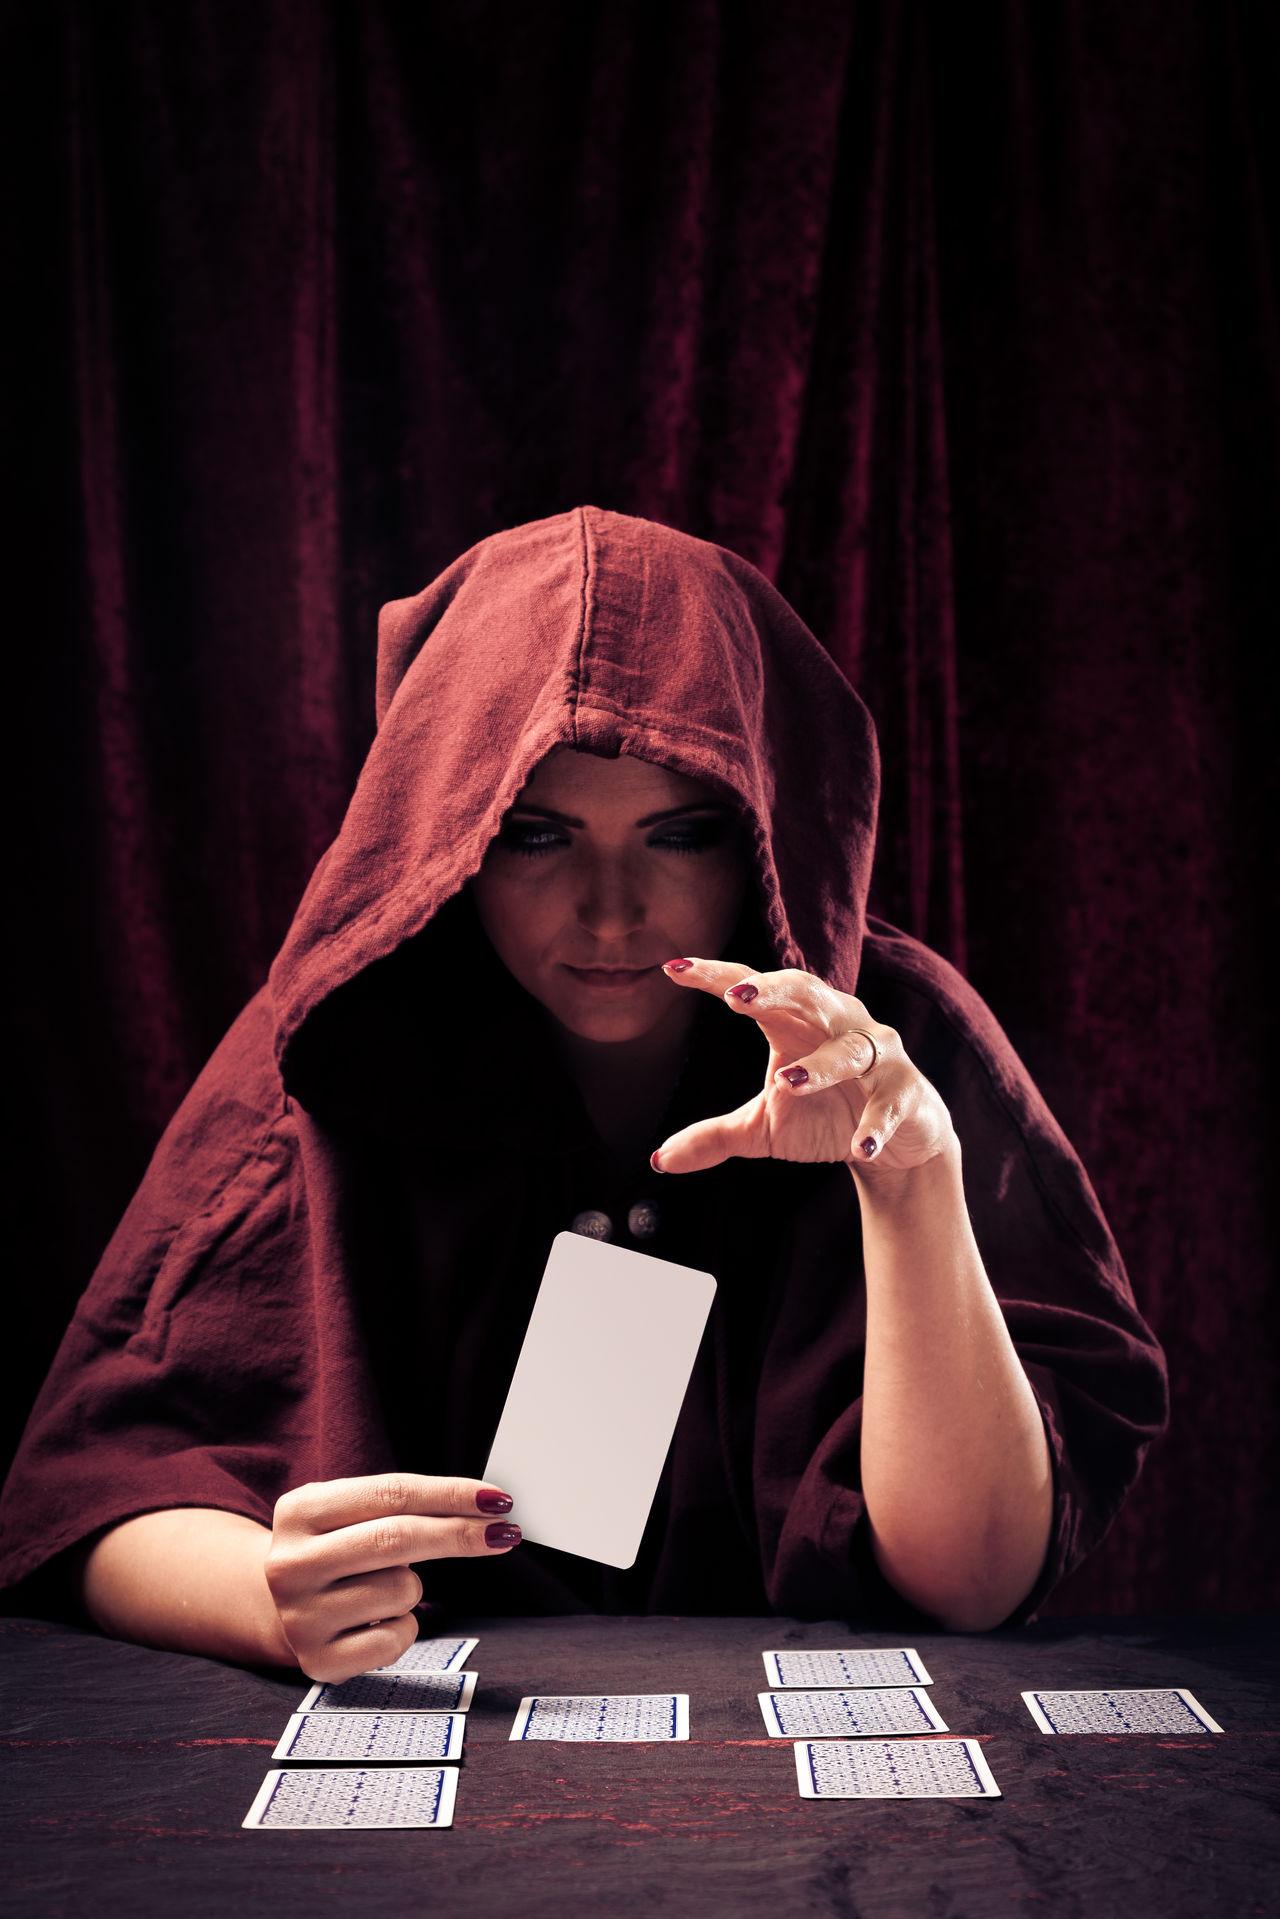 Studio shot of fortune teller. Card Forecast Fortune Teller Fortune Telling Future Magic Paranormal Portrait Psychic Medium Red Spooky Studio Shot Tarot Woman Women Young Women